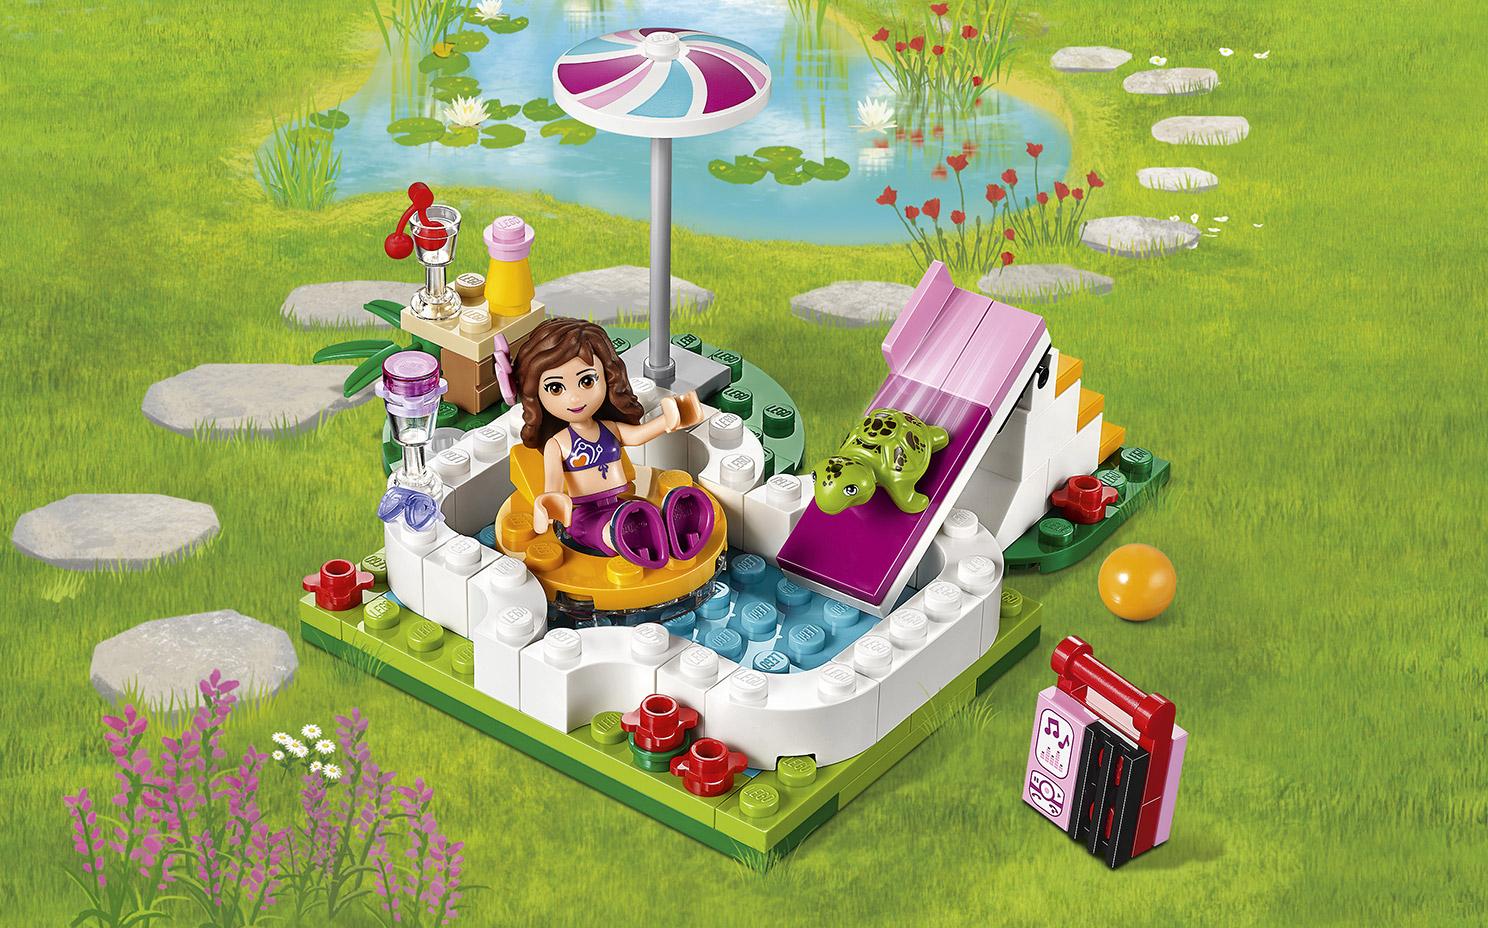 41090 La piscine d Olivia   Wiki LEGO   FANDOM powered by Wikia a1cd68aaaf65